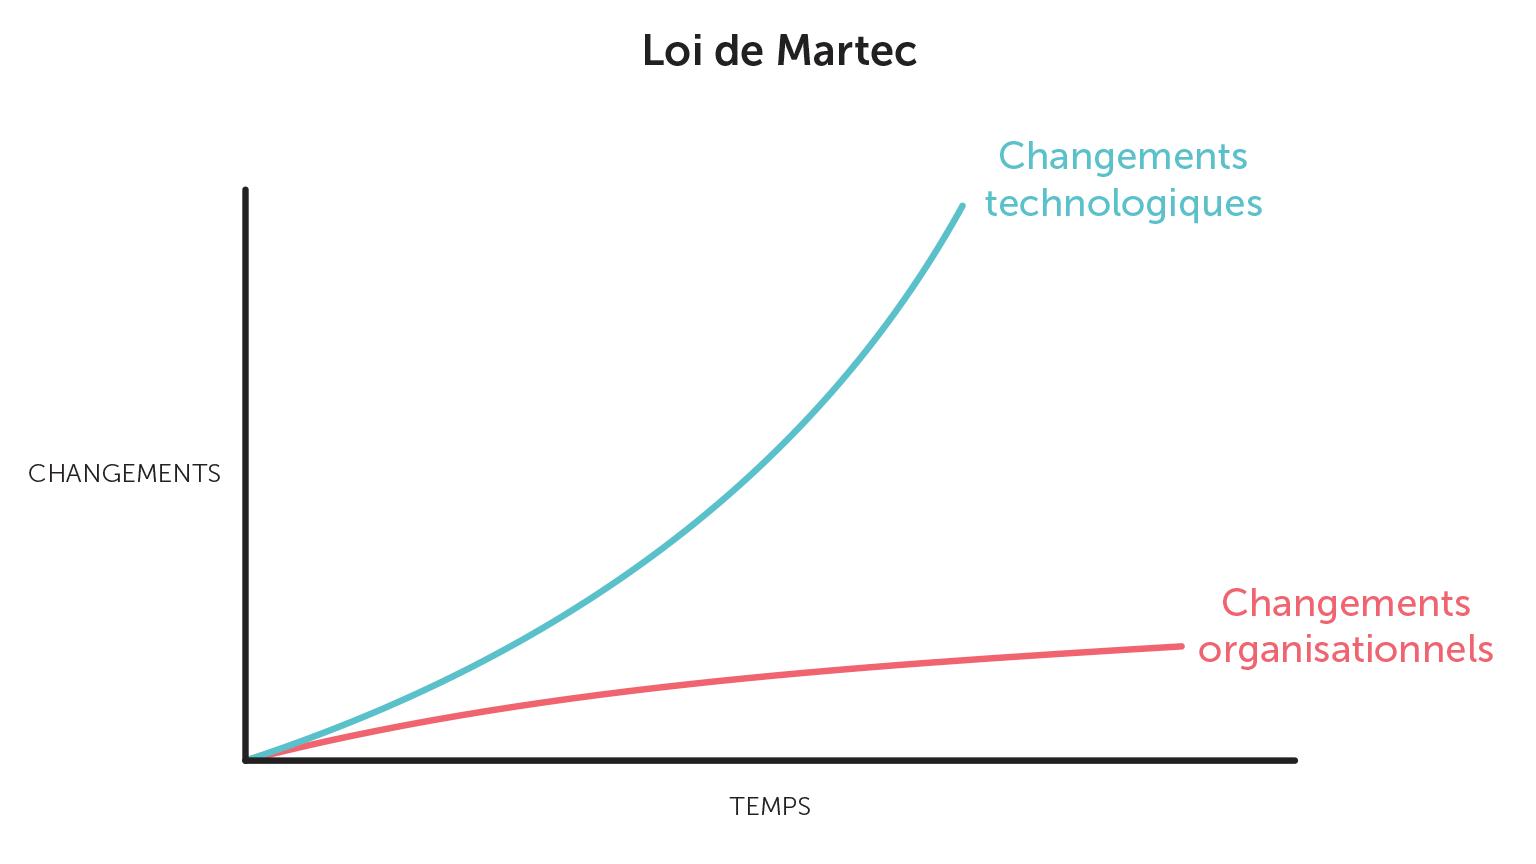 Graphique de la loi de Martec